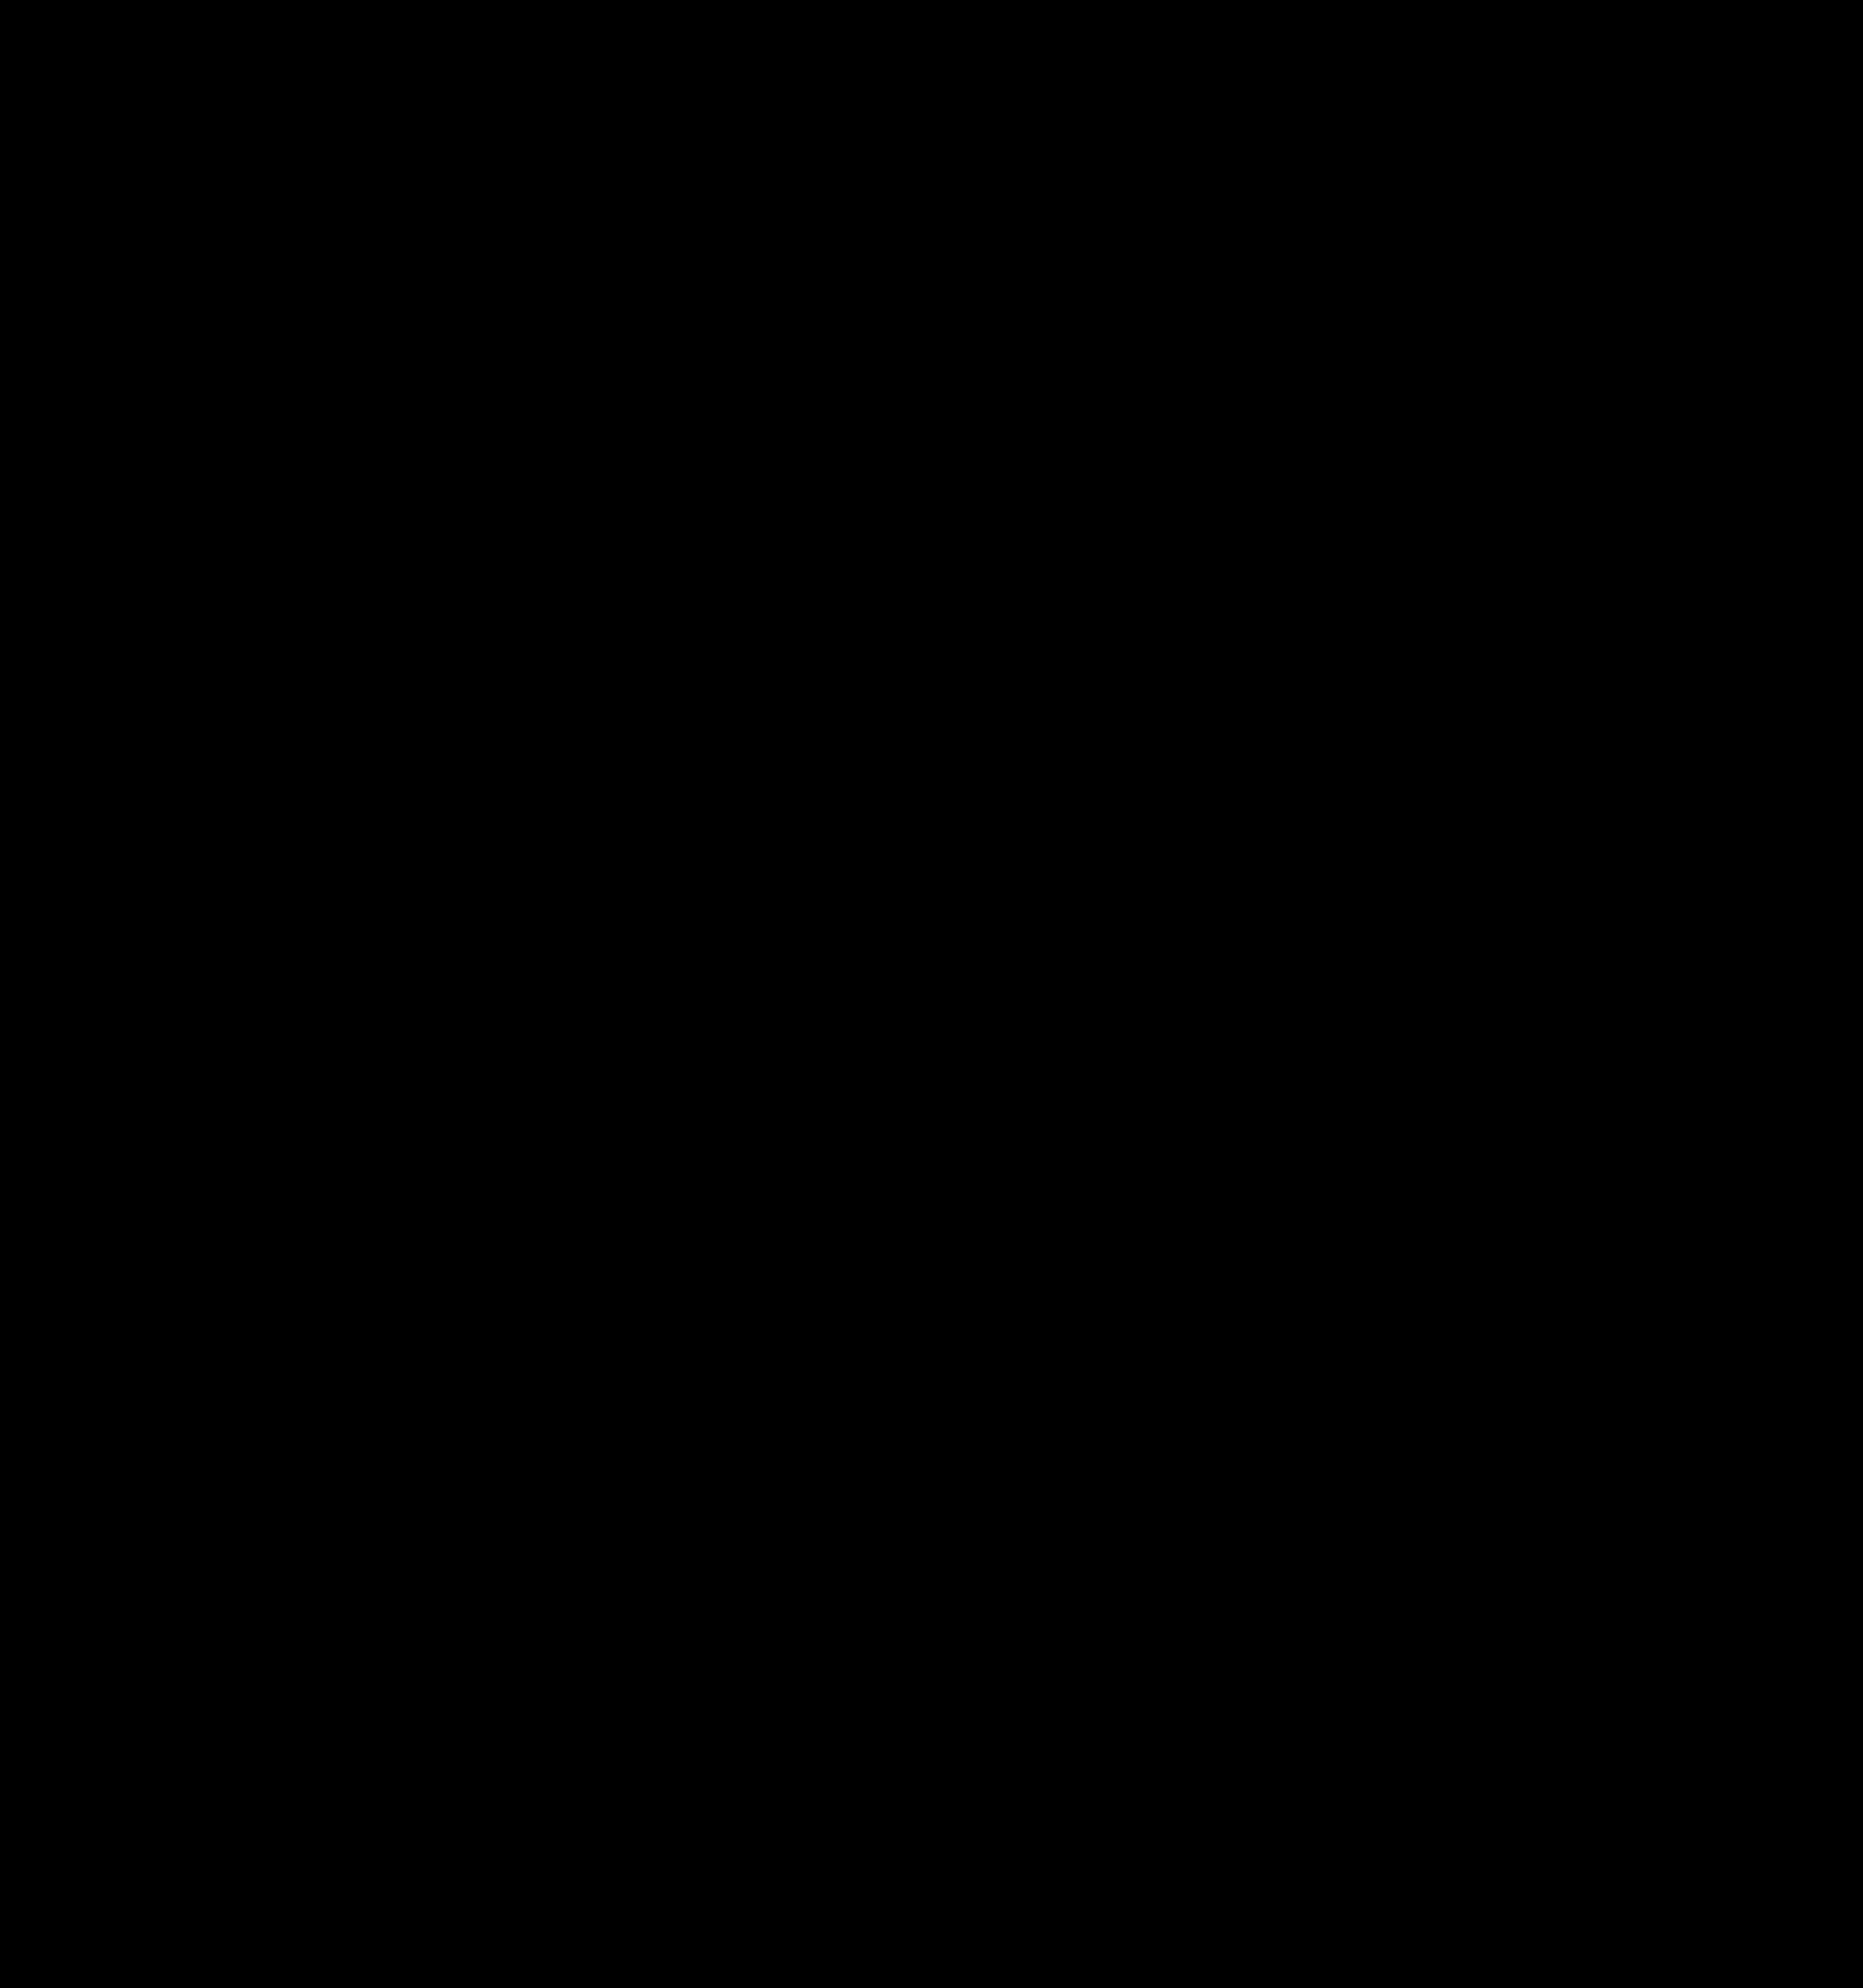 Soccer kick silhouette